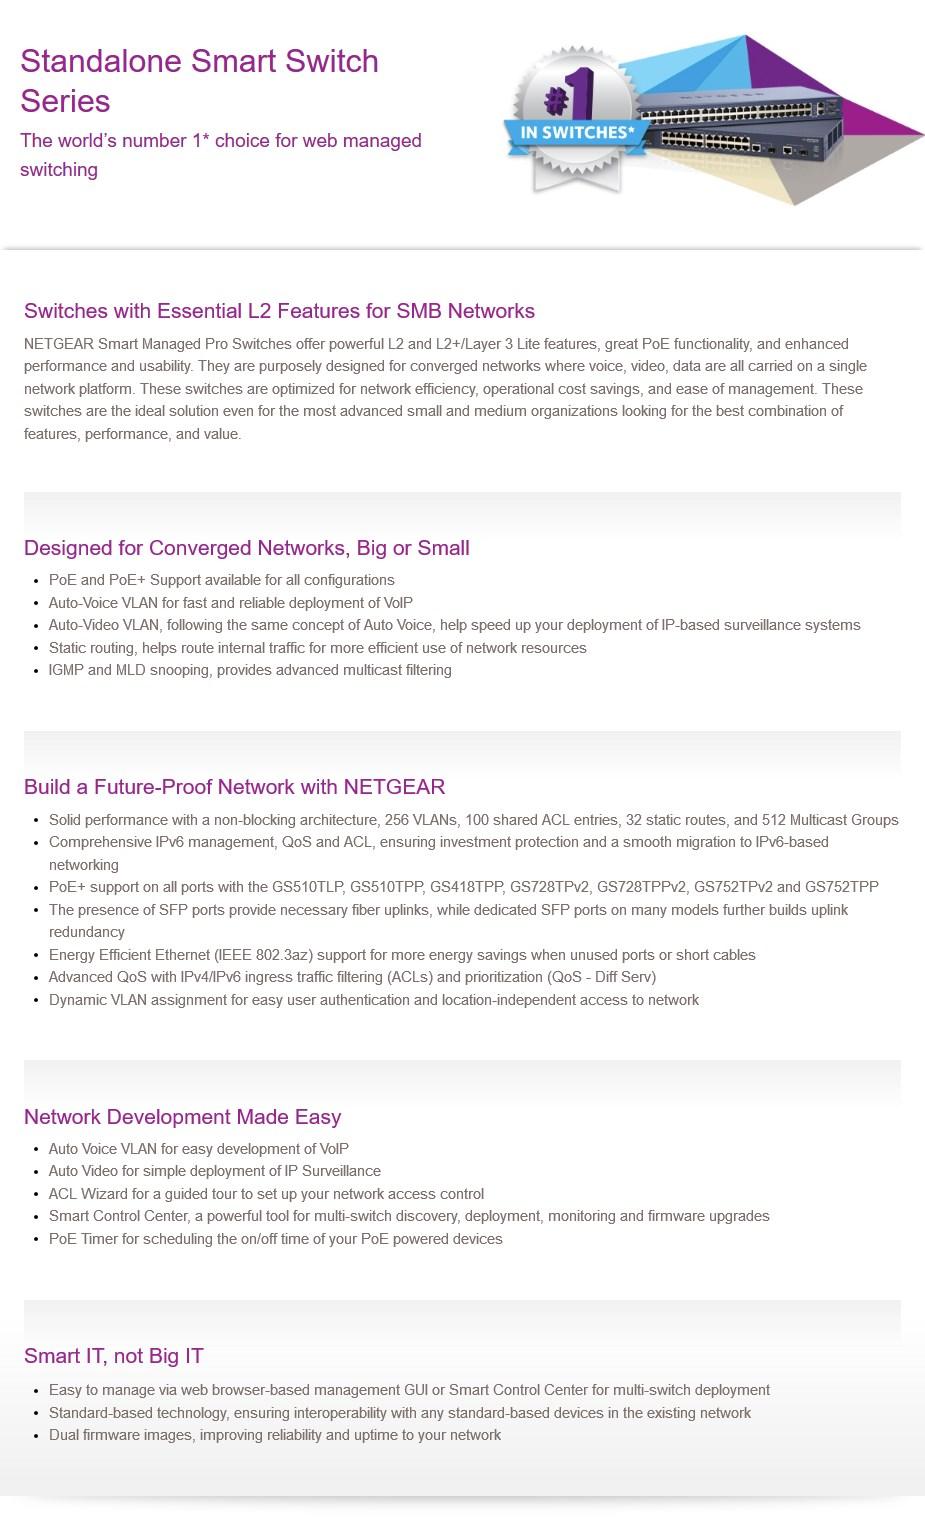 Netgear GS752TP 48-Port Gigabit PoE+ Smart Managed Pro Switch with 4 SFP Ports - Desktop Overview 1